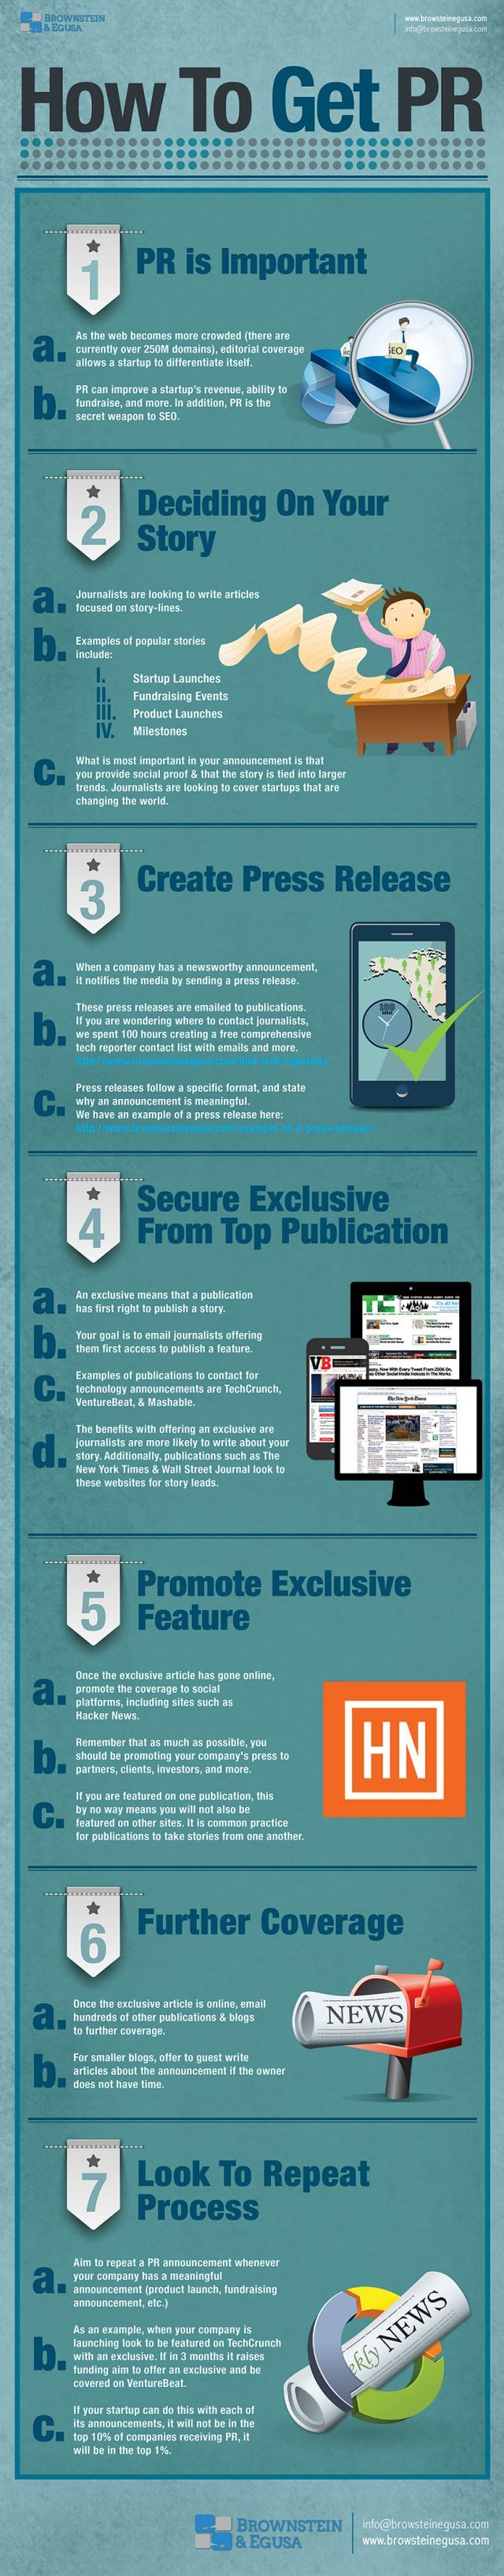 How To Get Pr Marketing Technology Marketing Technology Startup Marketing Infographic Marketing